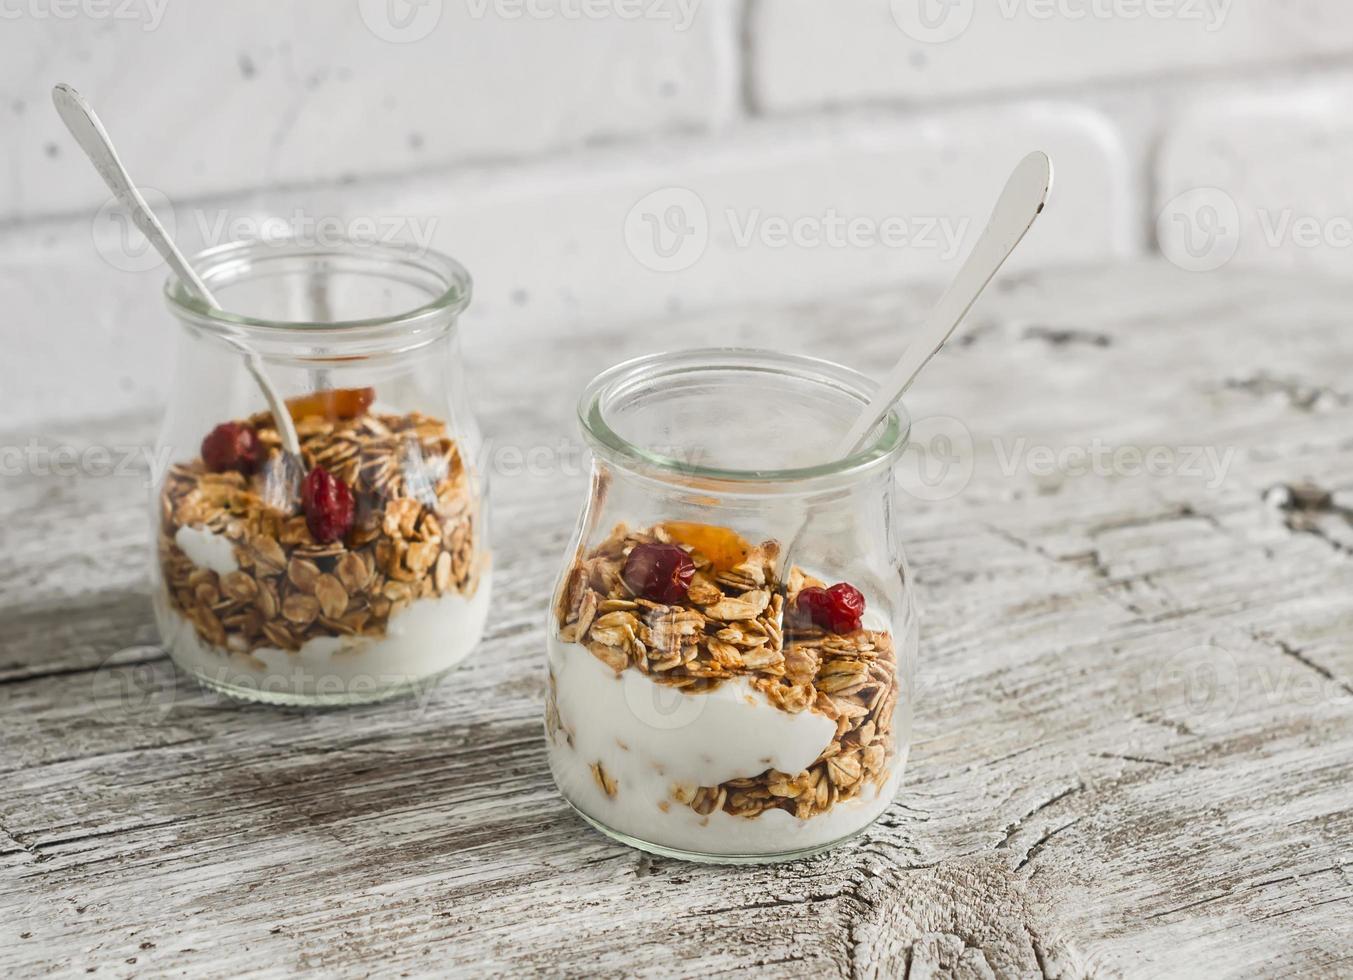 granola casera y yogurt natural. comida sana foto